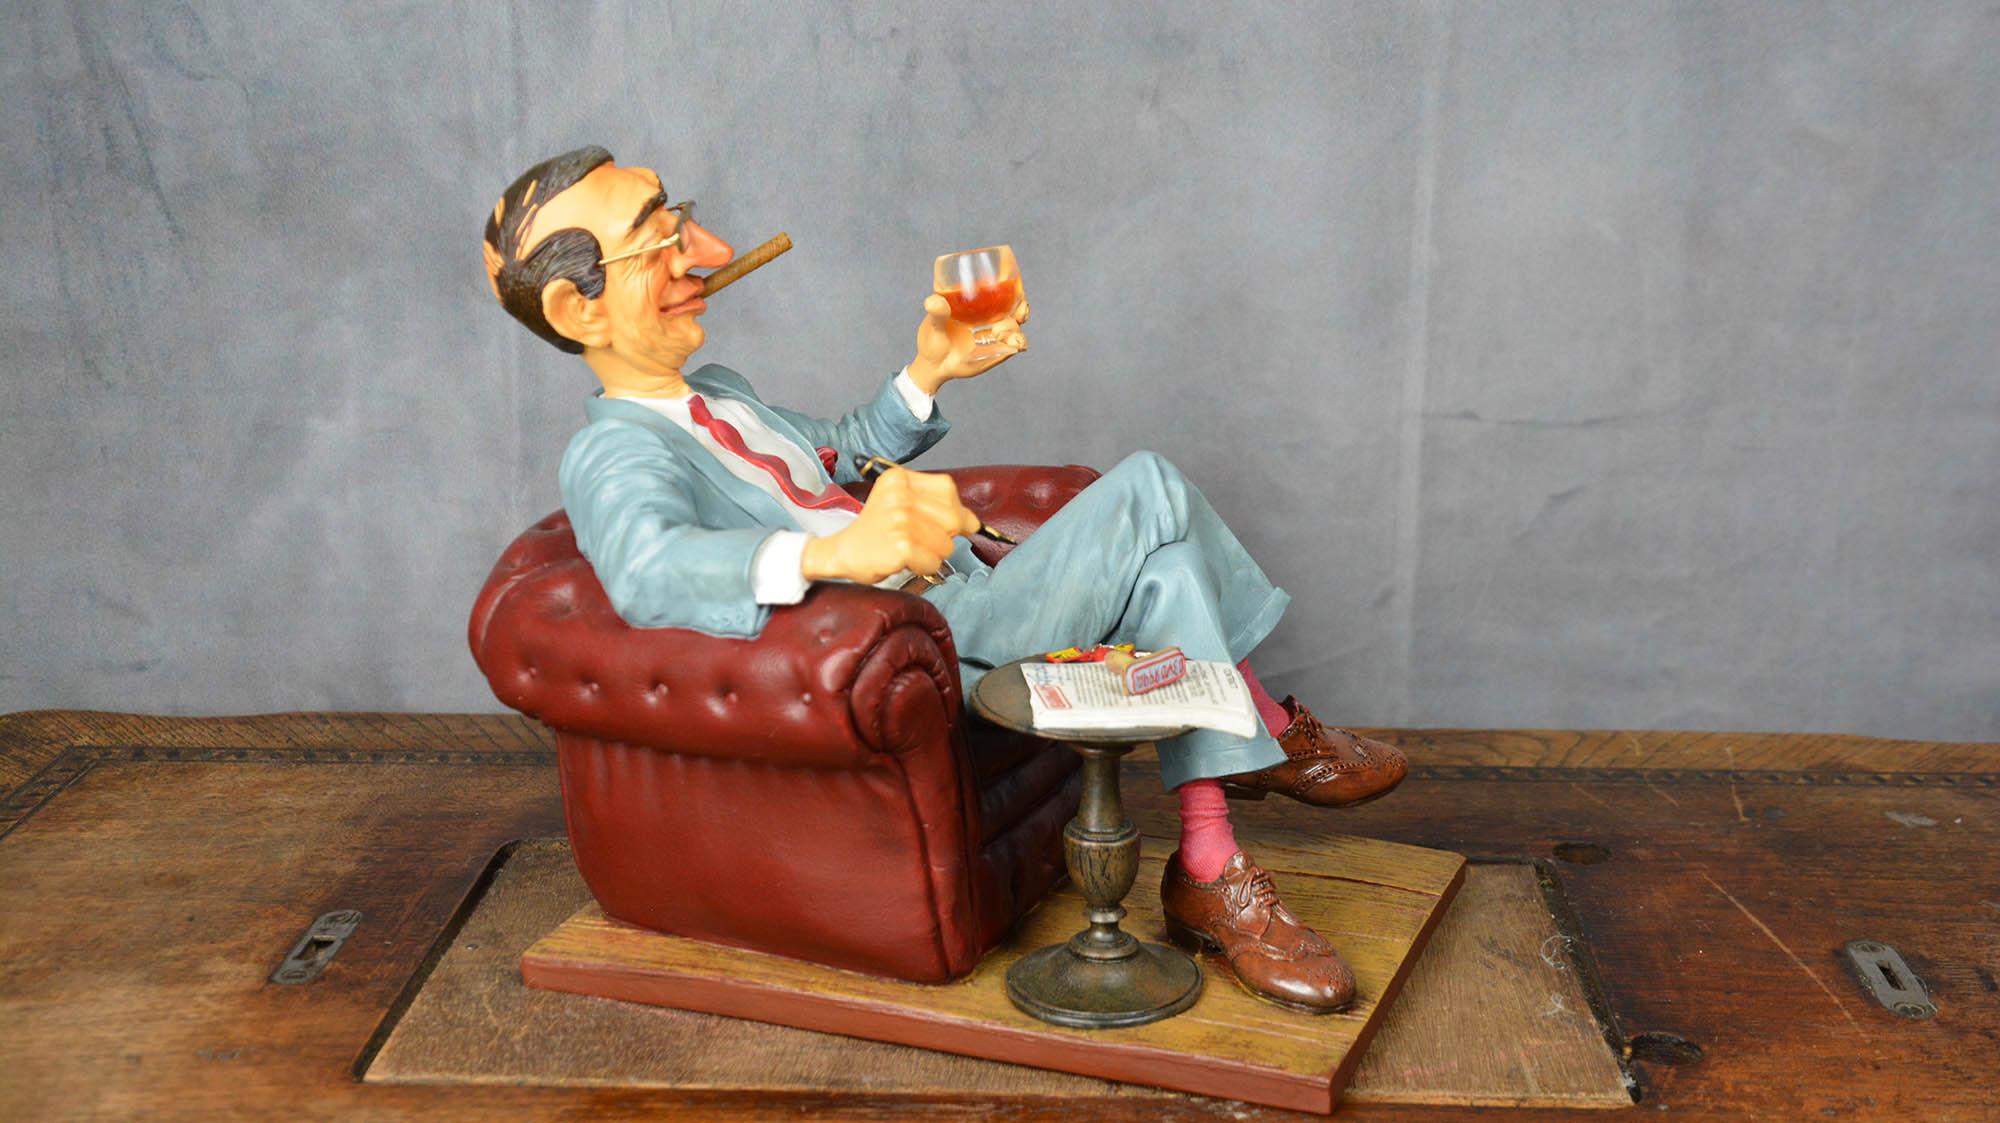 boutique figurine piece artisanale personnage boss parodie